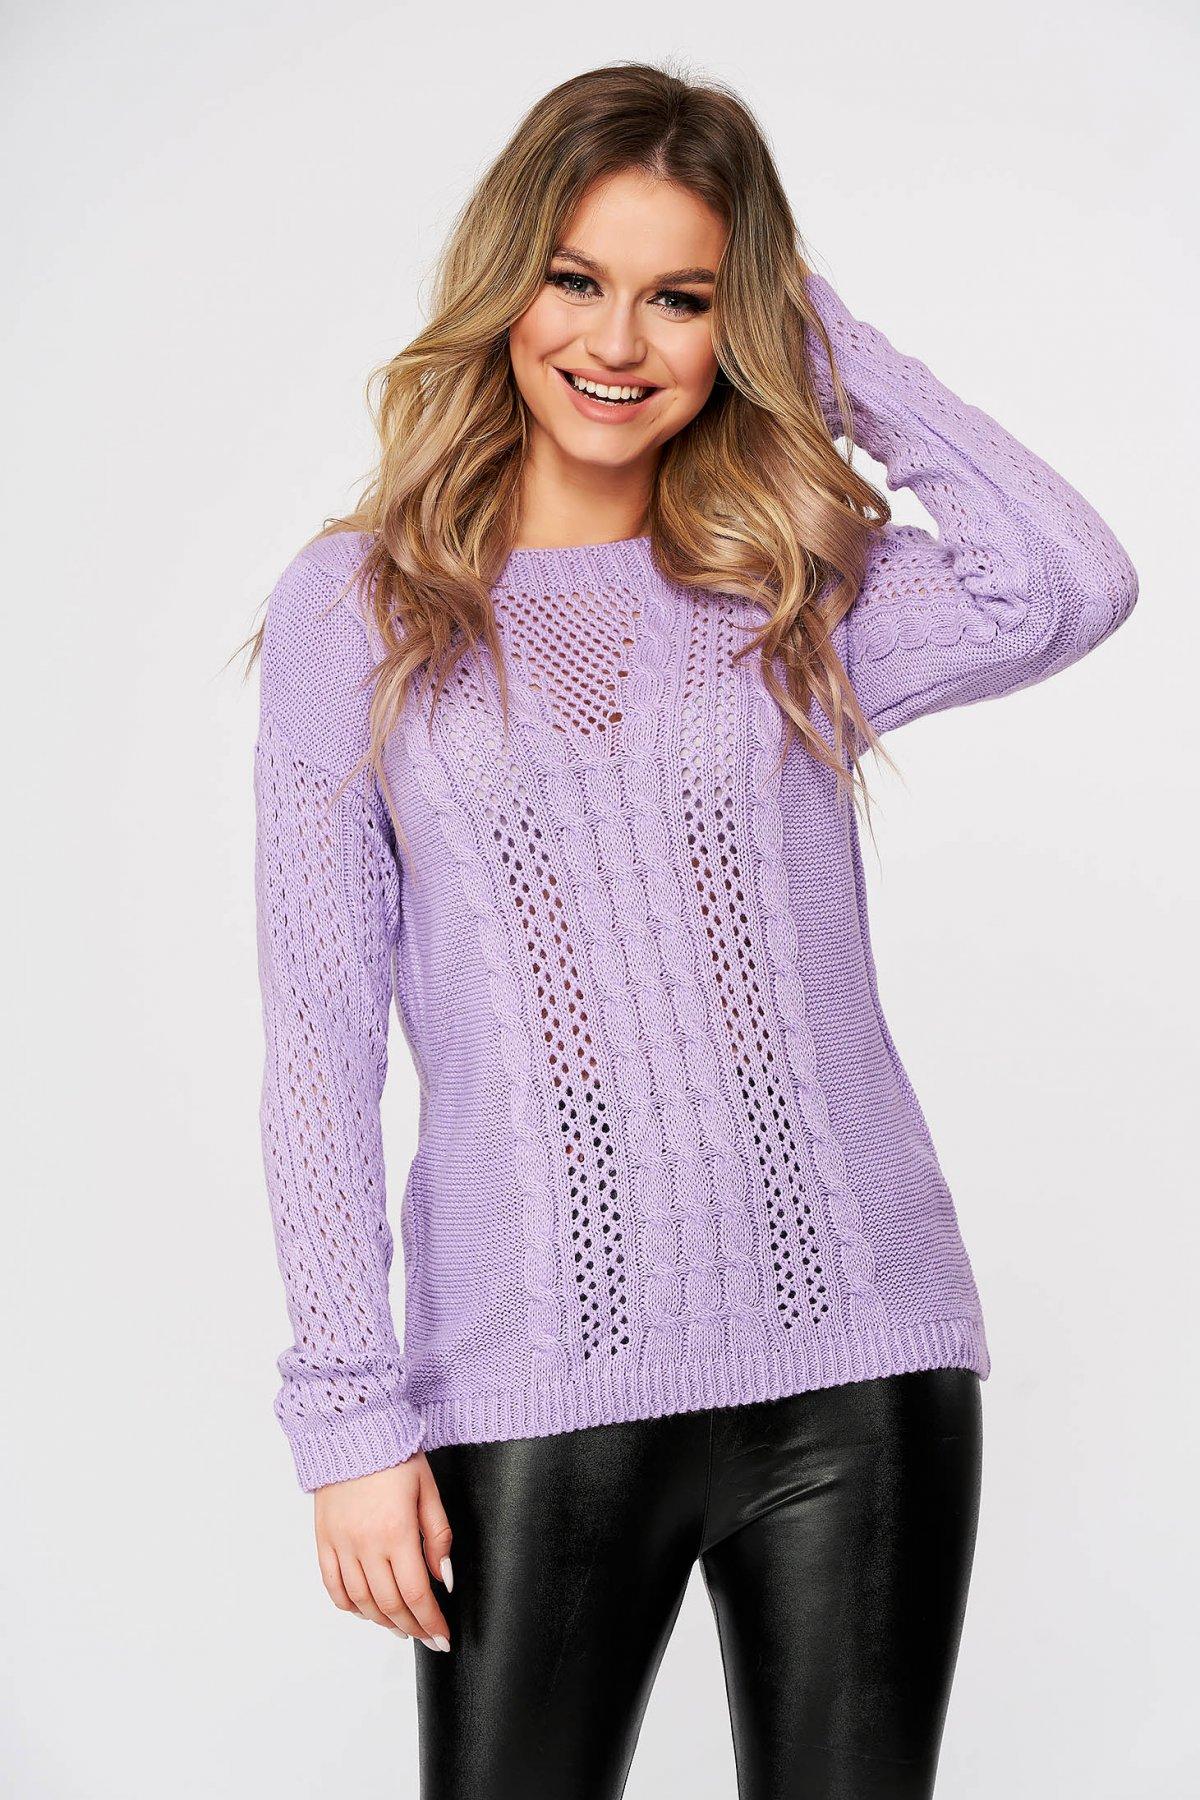 Pulover SunShine lila casual tricotat cu croi larg si guler barcuta